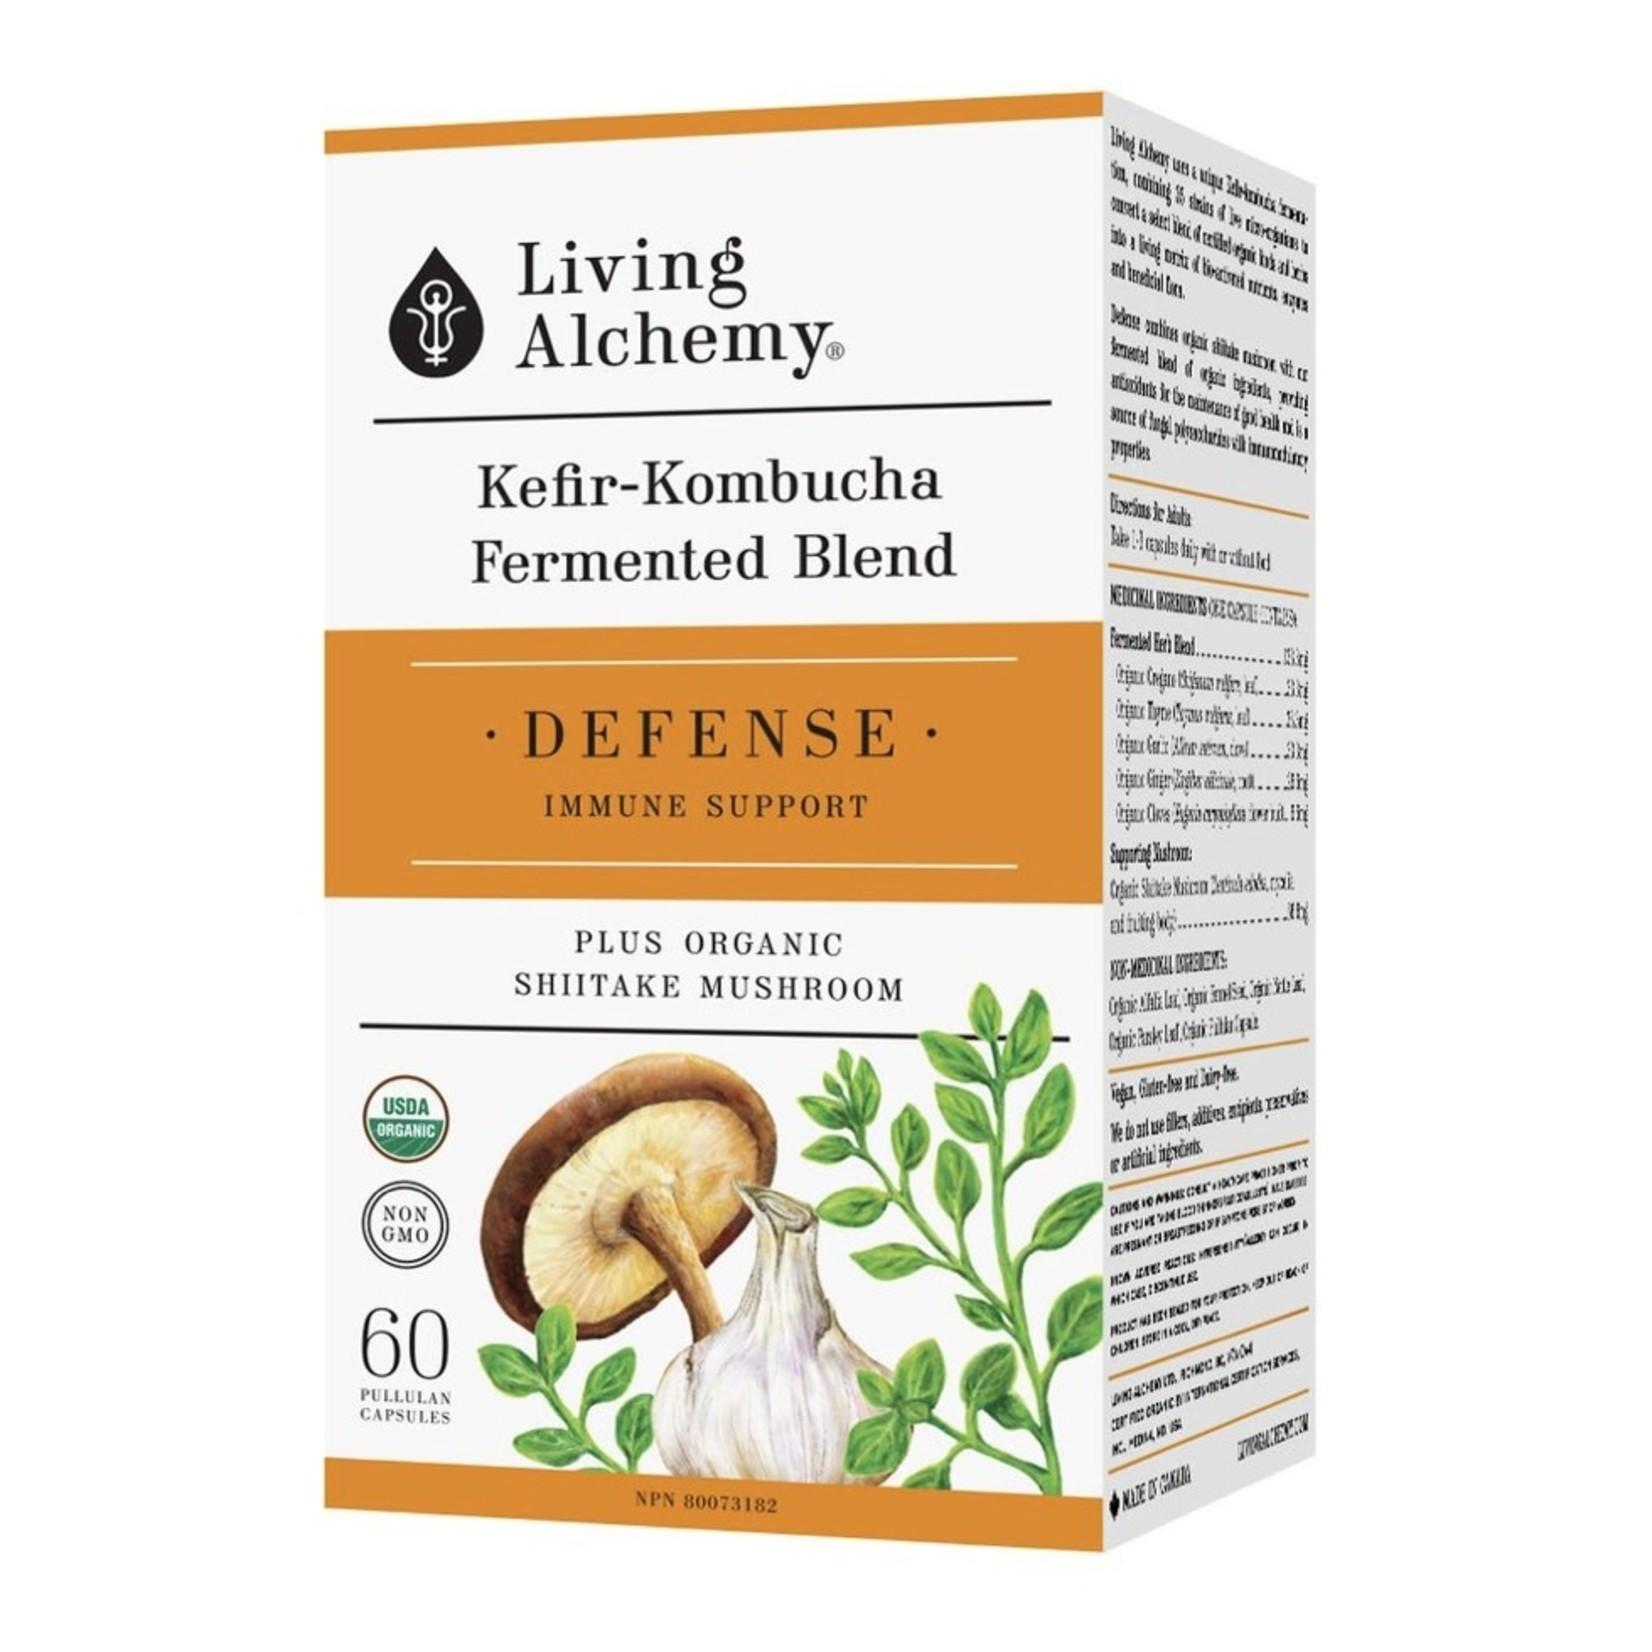 Living Alchemy Living Alchemy - Defense 60 caps